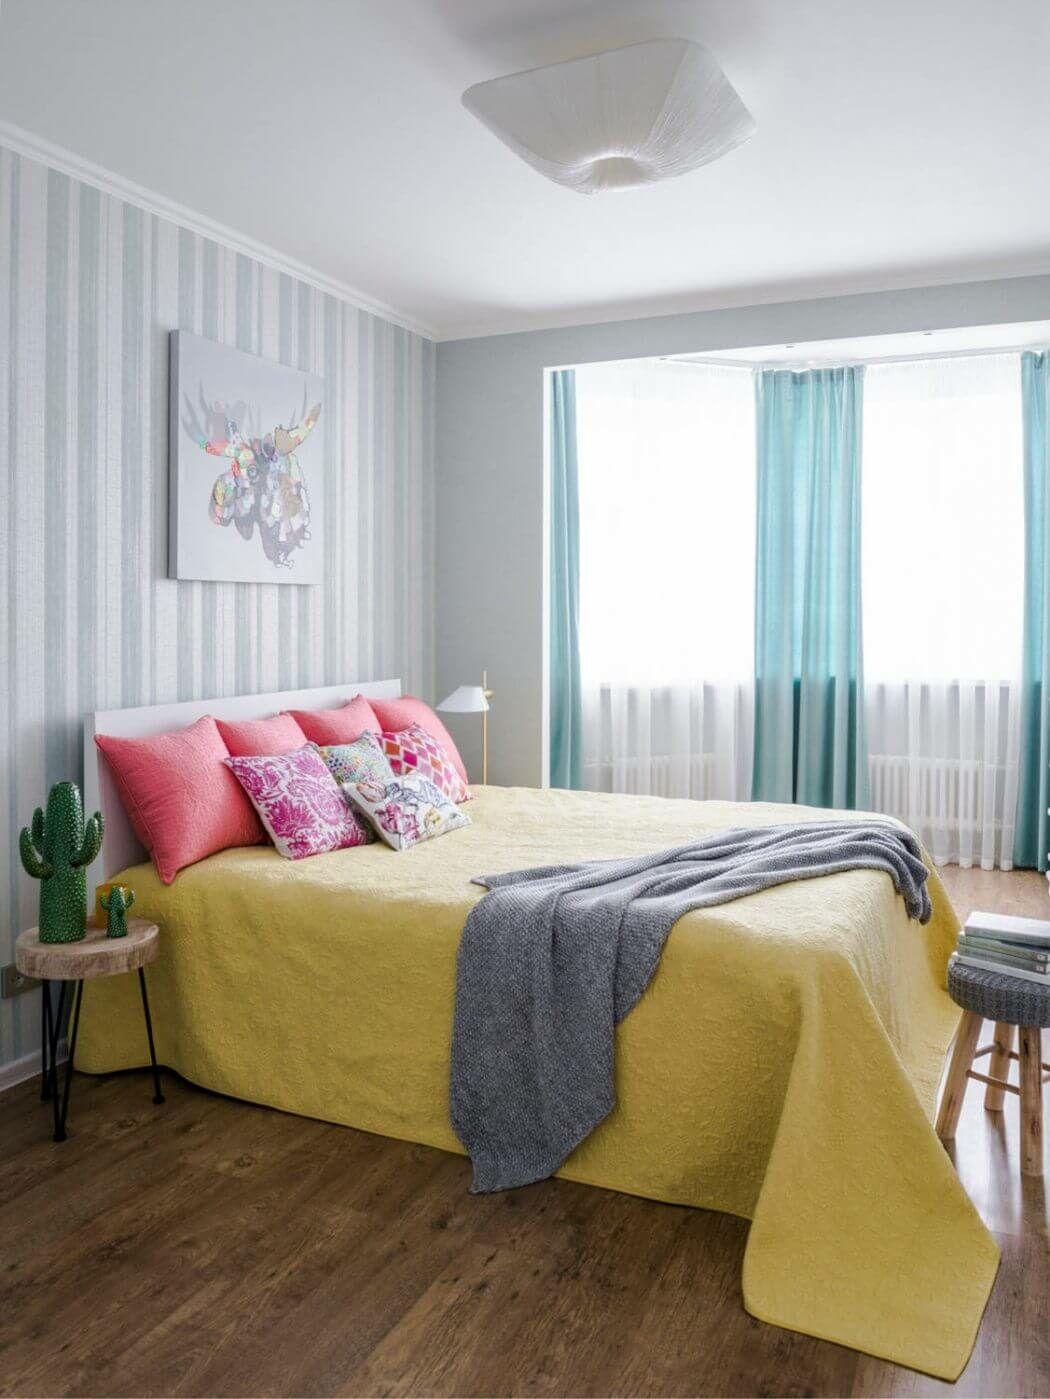 016-apartment-belyakov-karayani-design-studio-1050x1399-8013149